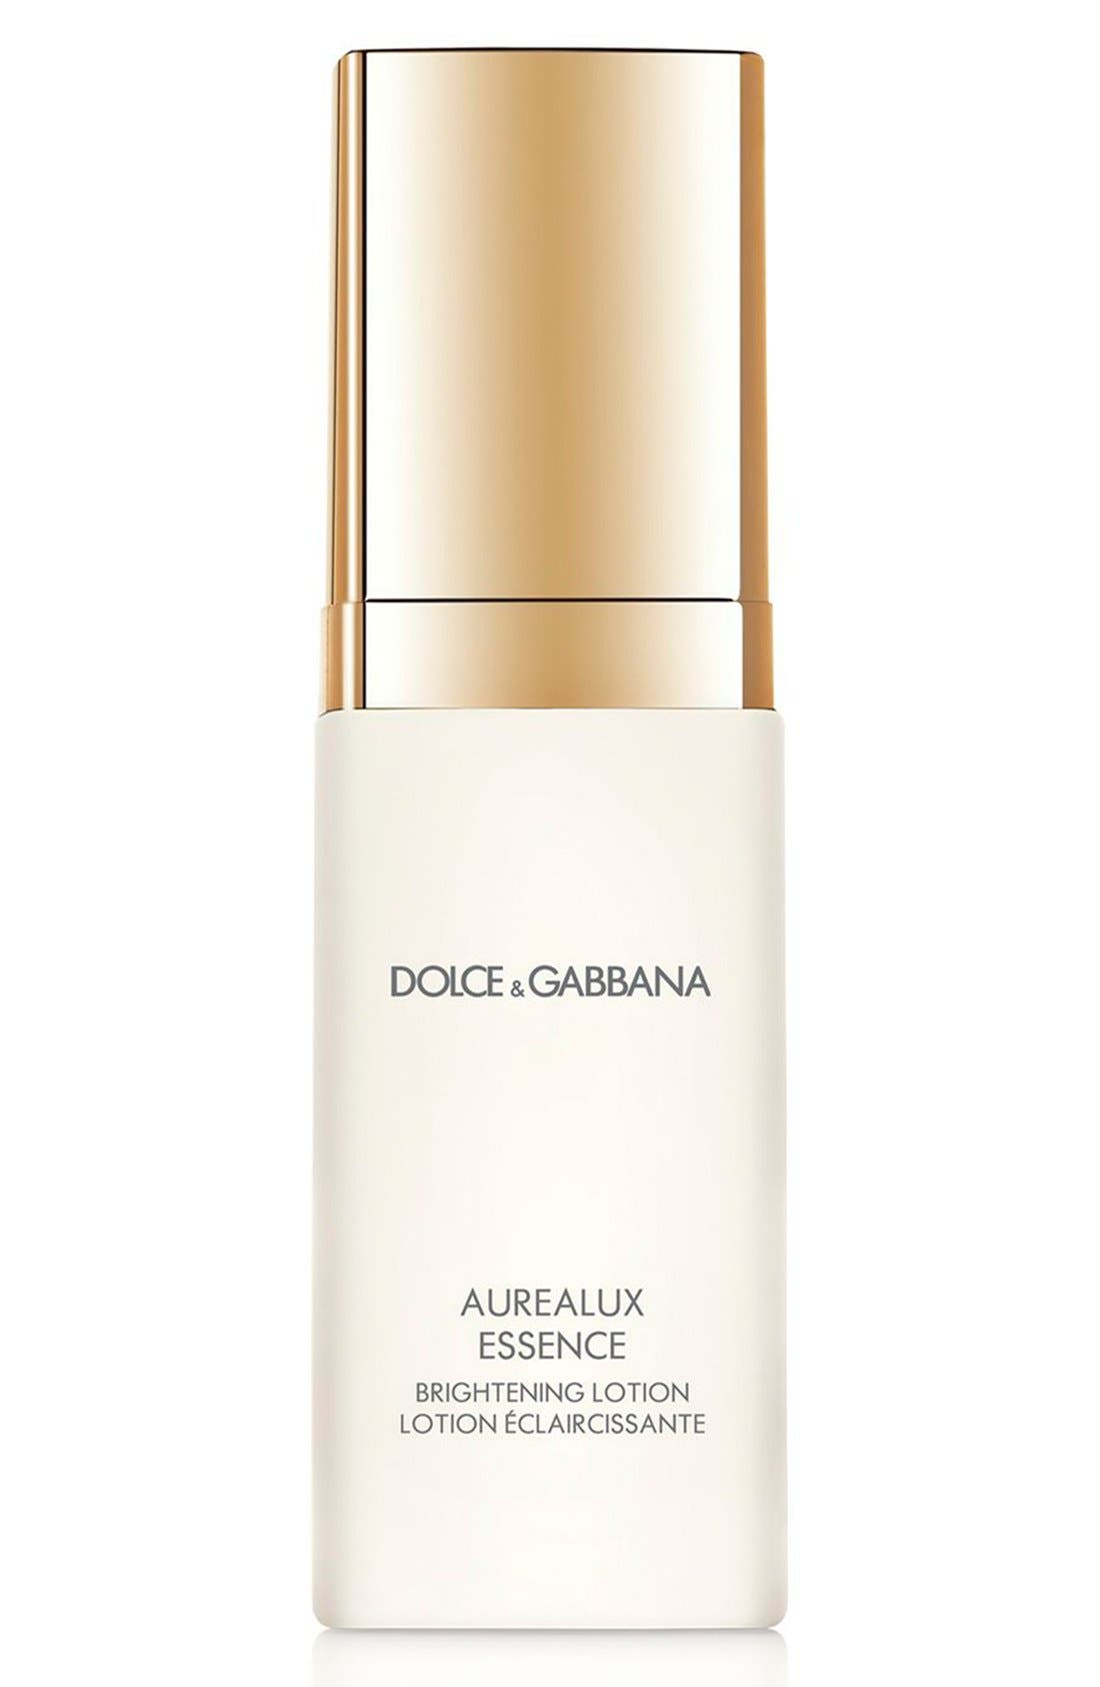 Dolce&GabbanaBeauty 'Aurealux' Essence Brightening Lotion